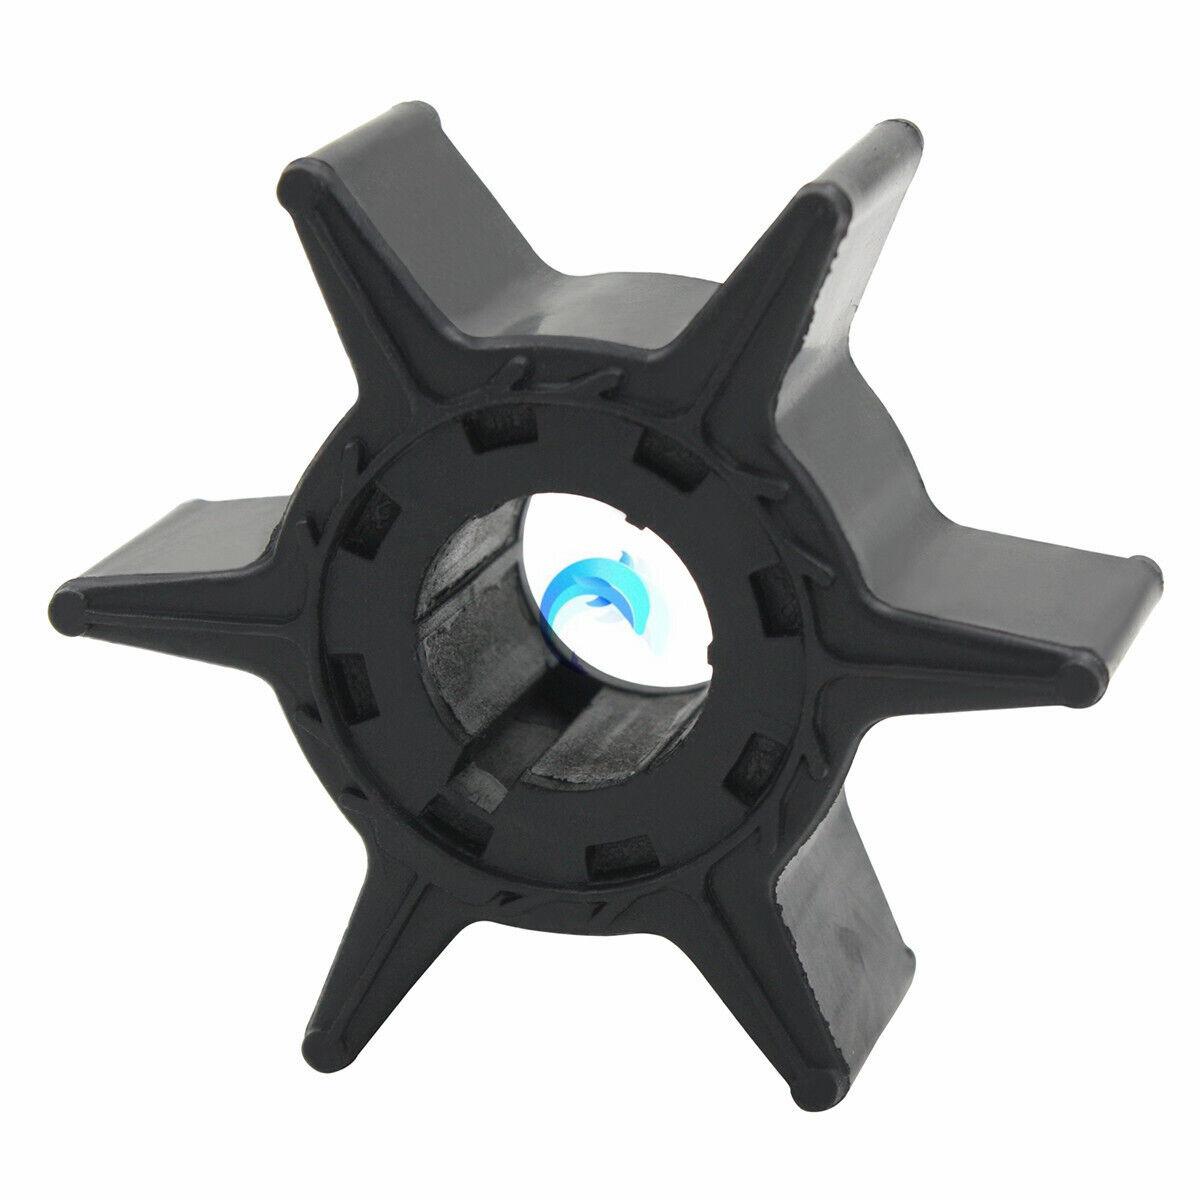 New Impeller for YAMAHA 20D//25N 6L2-44352-00 18-3065 500384 9-45613